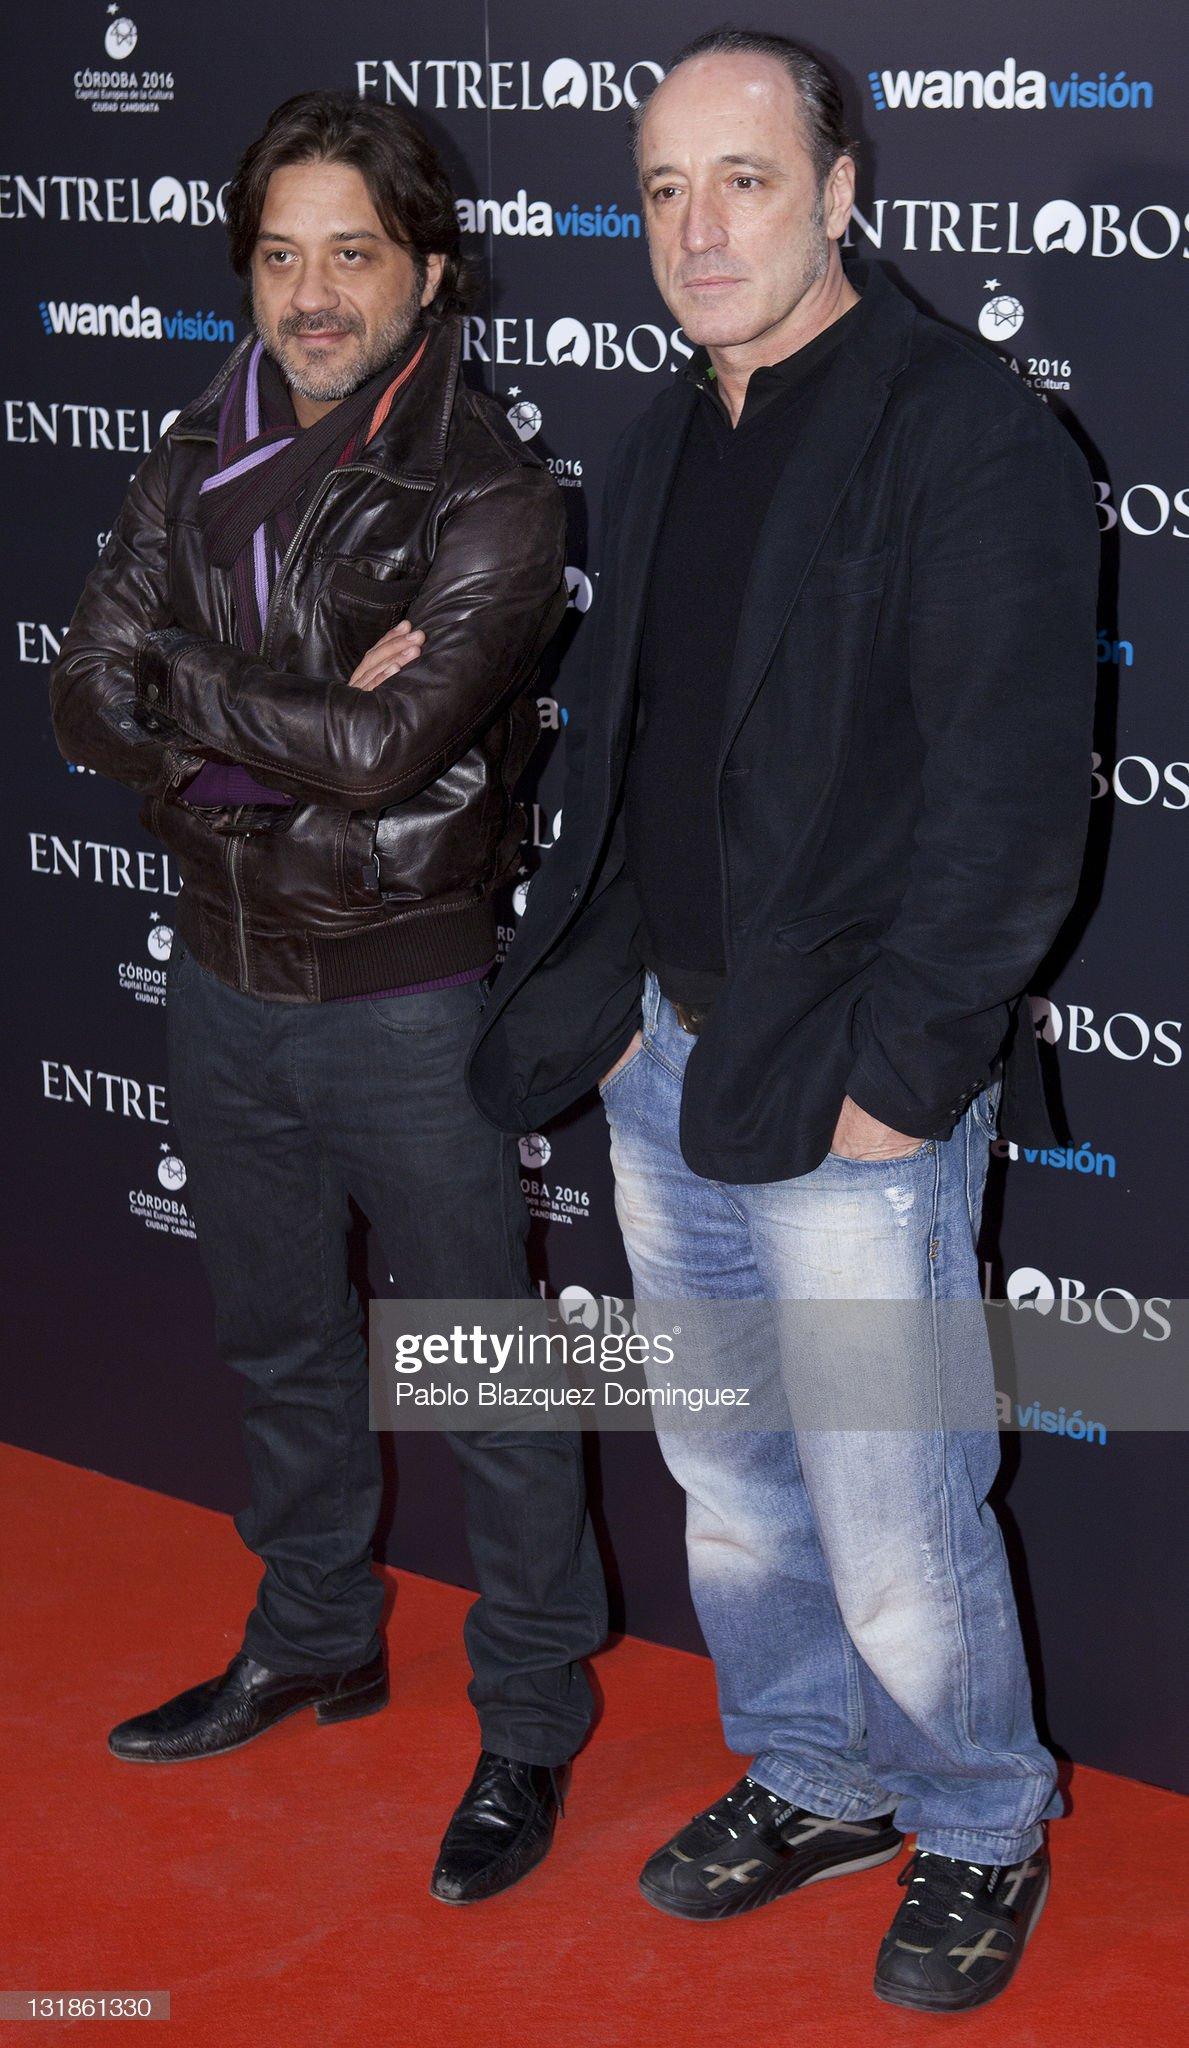 ¿Cuánto mide Enrique Arce? - Altura Spanish-actors-enrique-arce-and-roberto-alvarez-attend-the-entre-at-picture-id131861330?s=2048x2048